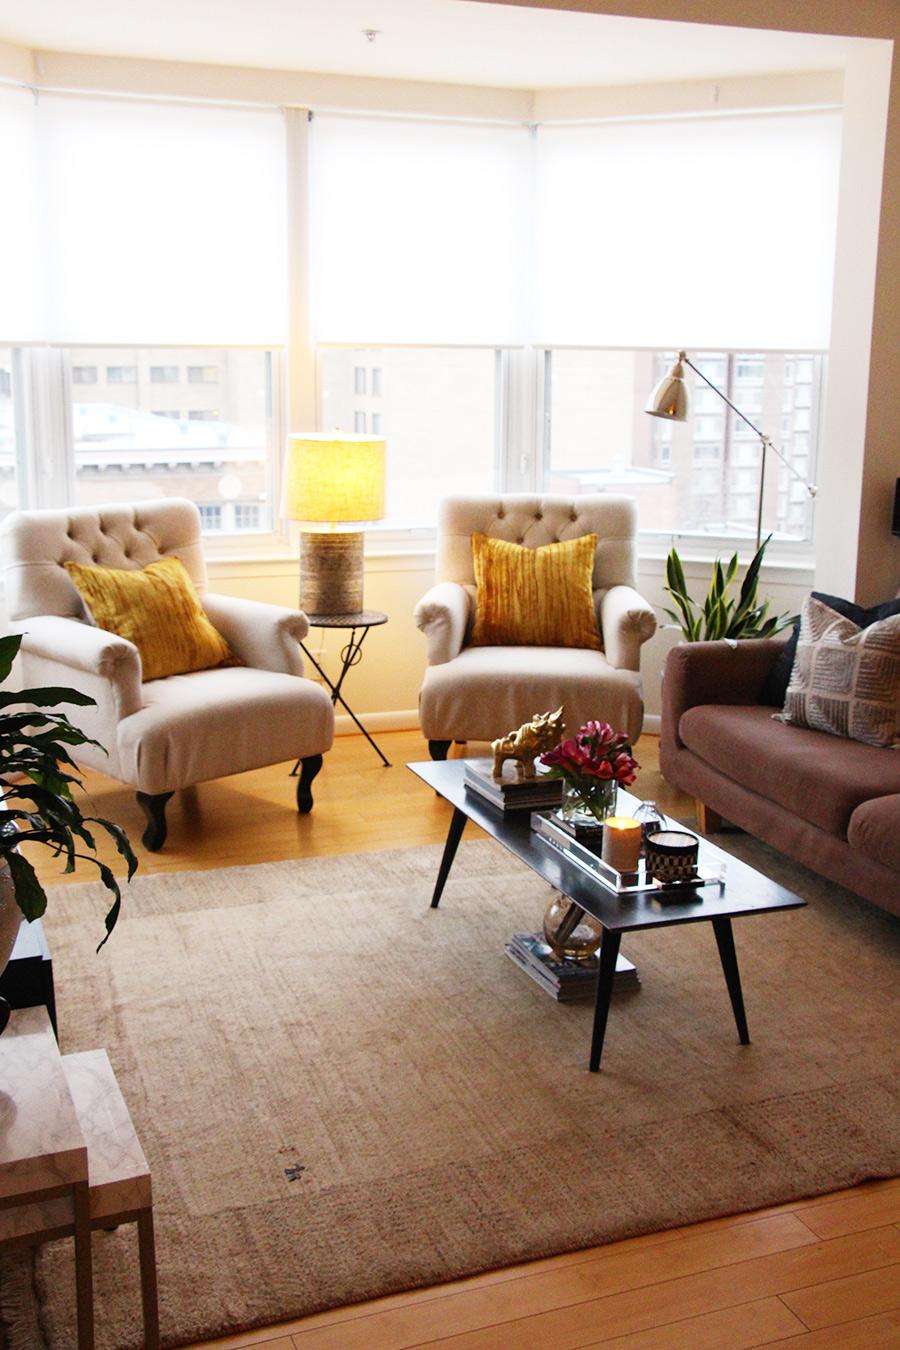 decoracion-espacios-splendor-styling.jpg